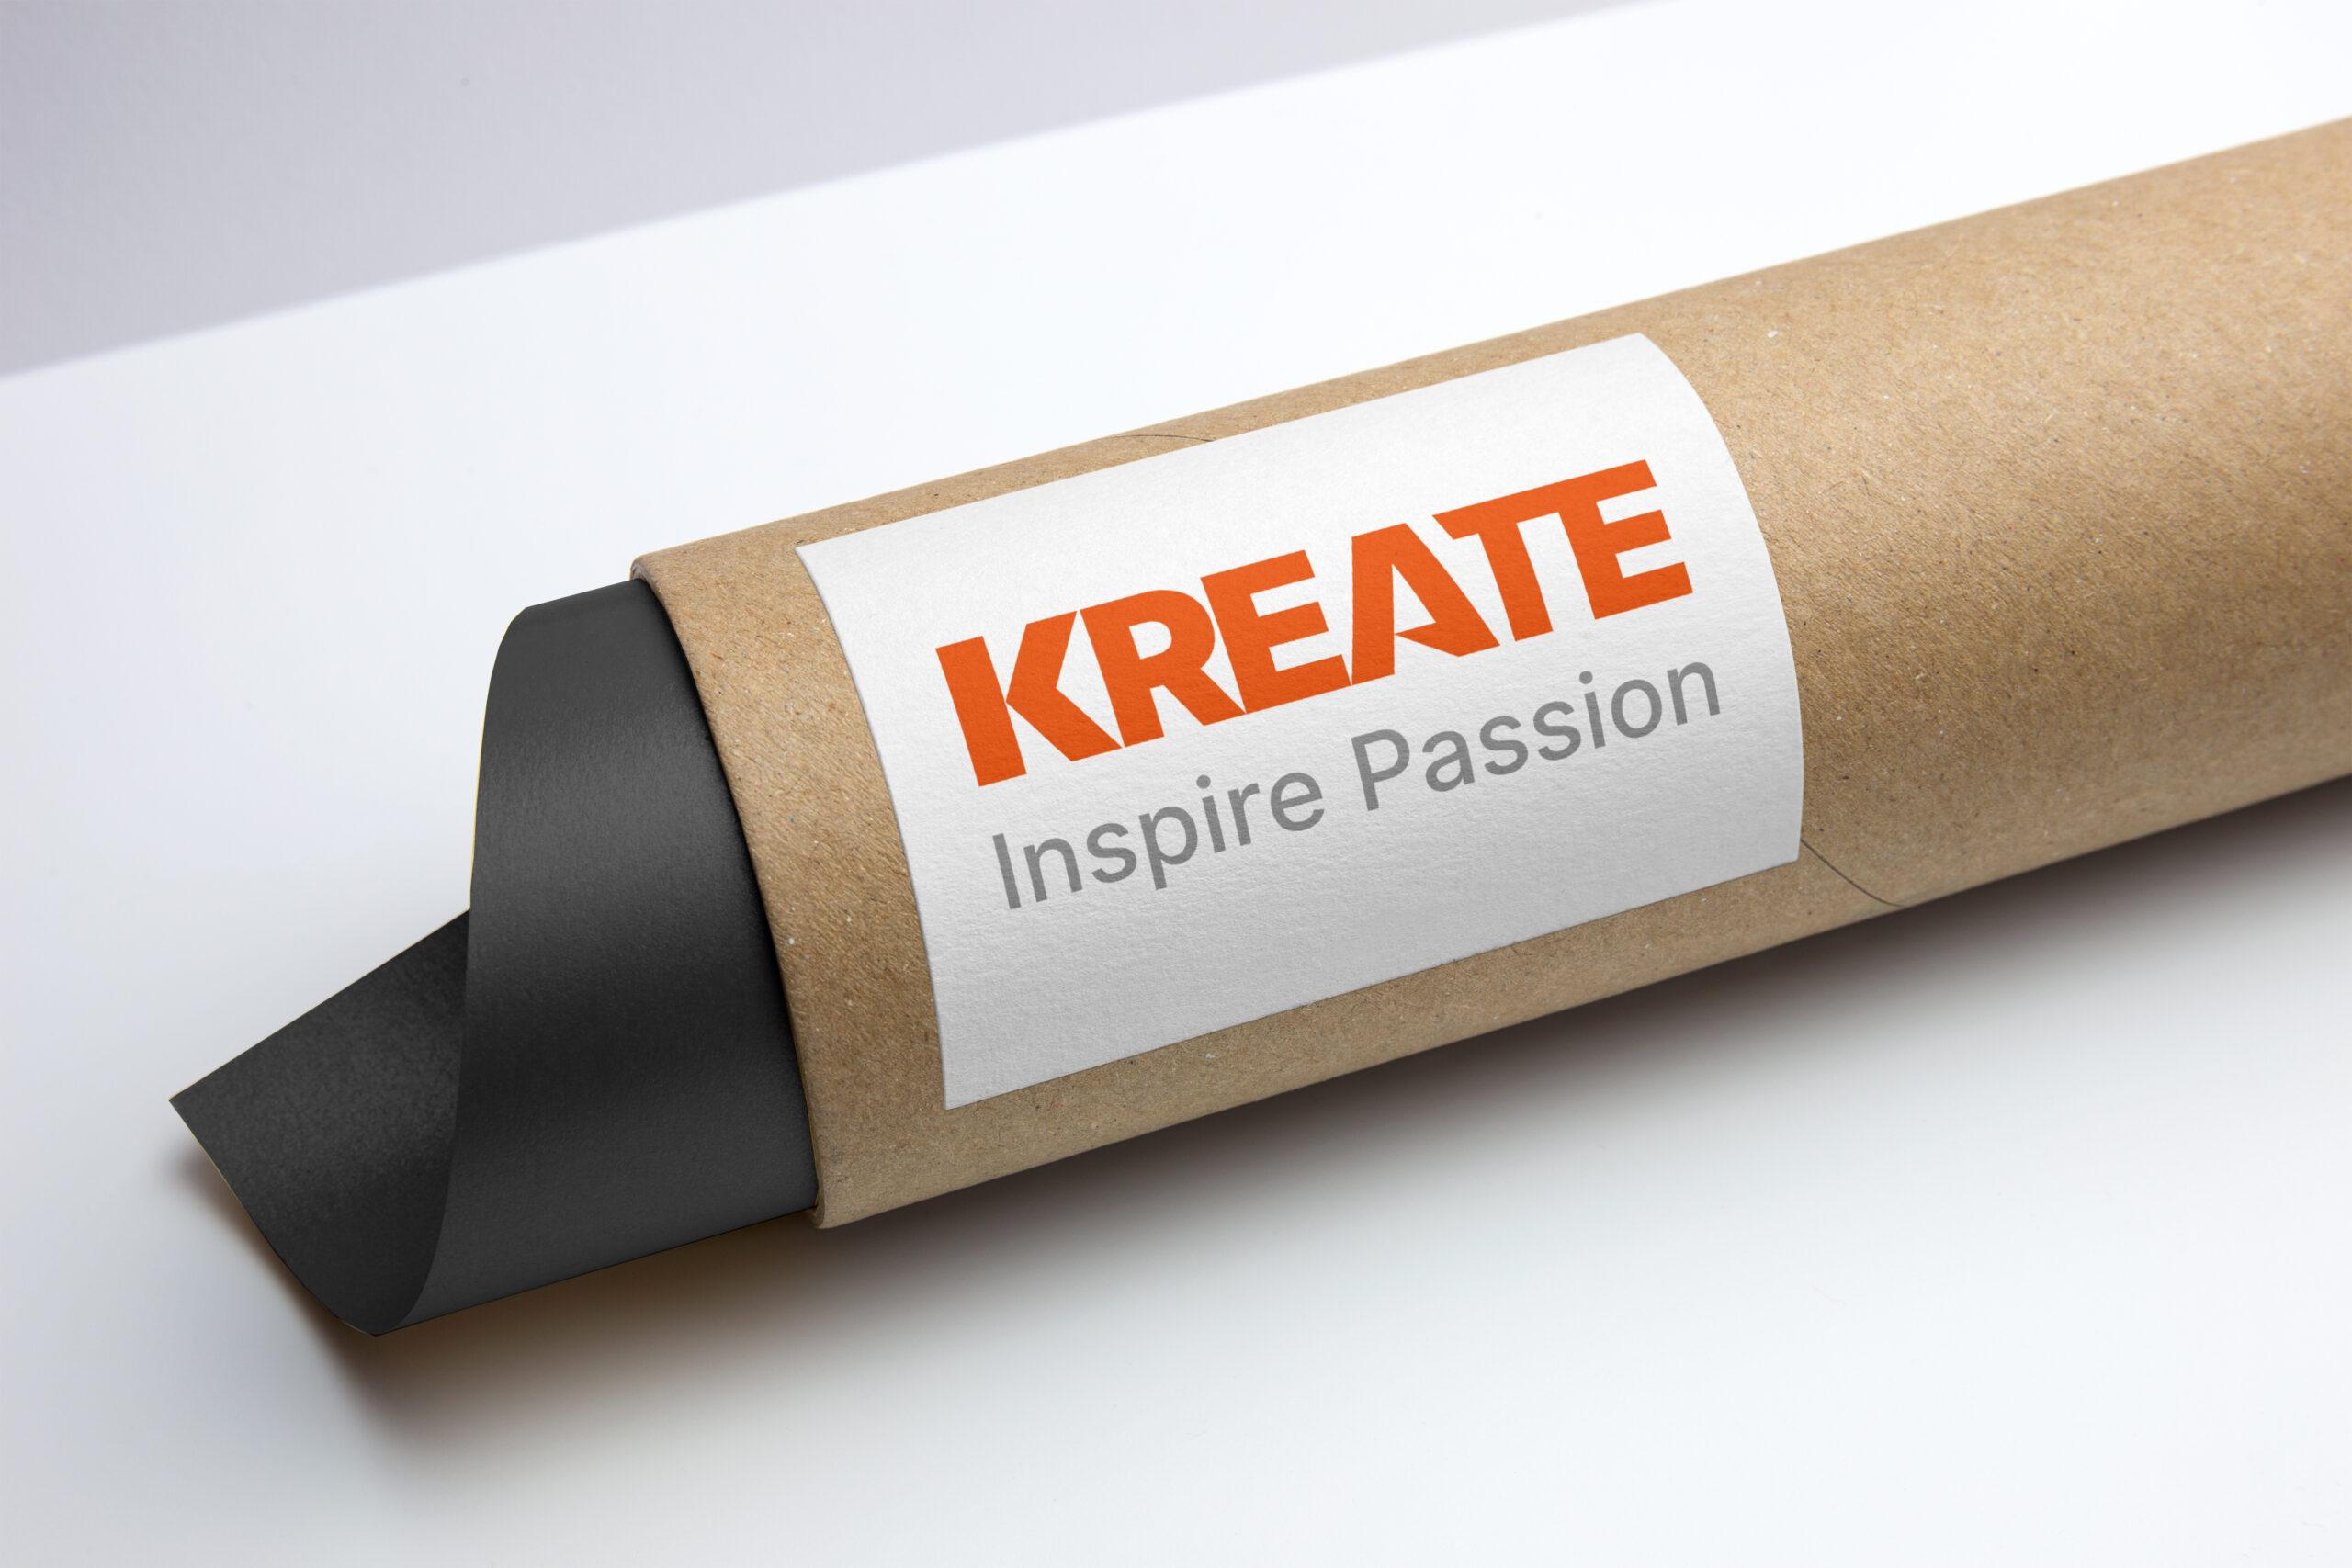 bdsapteltd_projects_kreate_banner-scaled.jpg